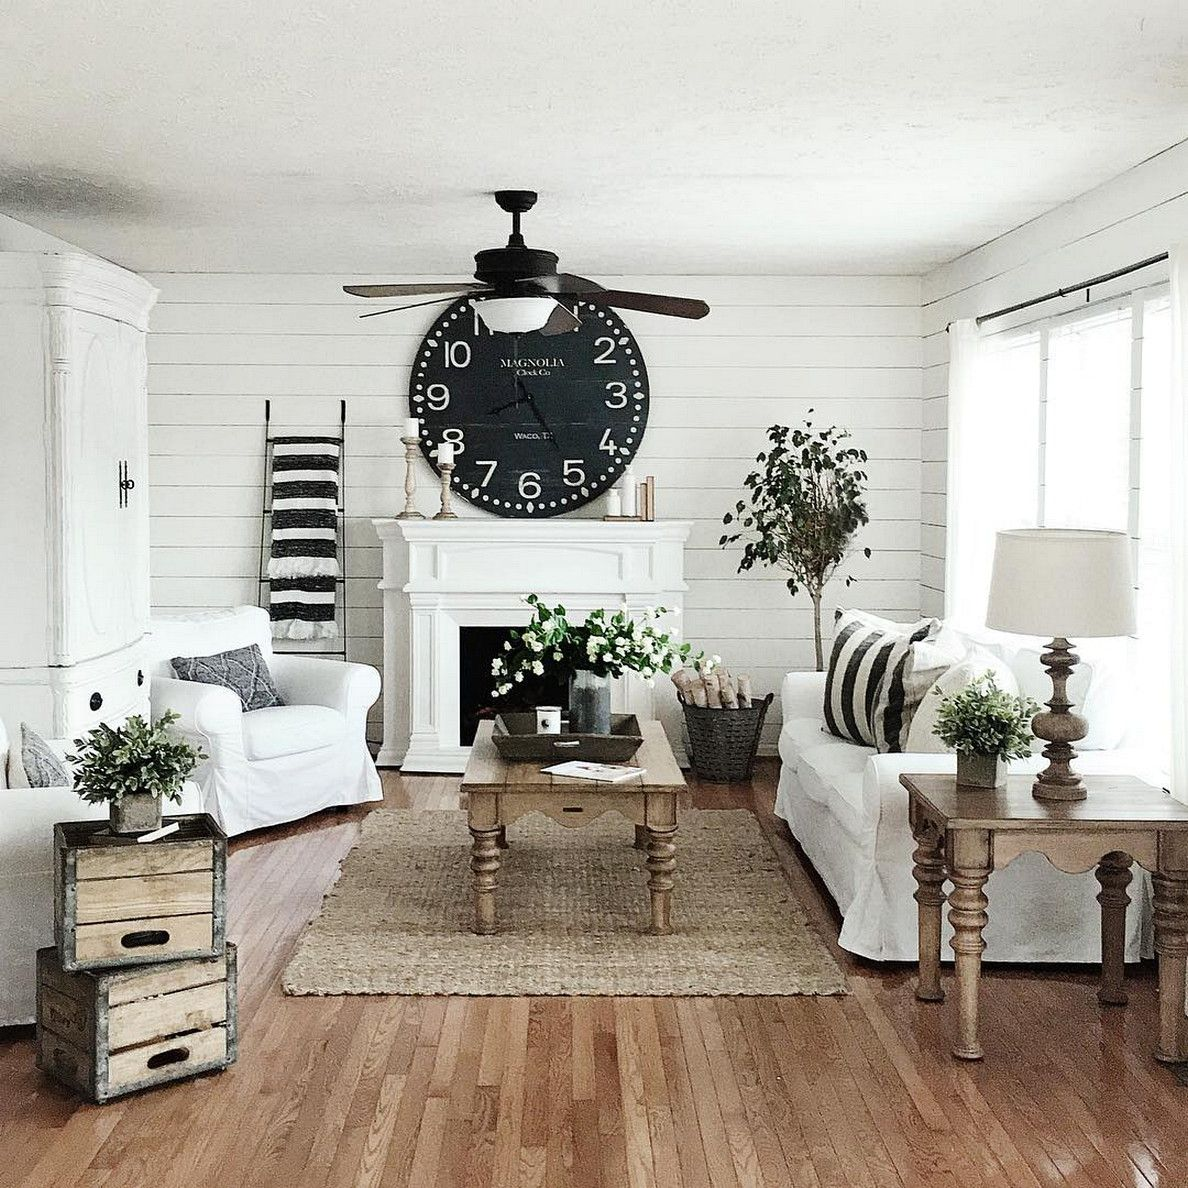 65 Comfy Modern Farmhouse Living Room Decor Ideas And Designs